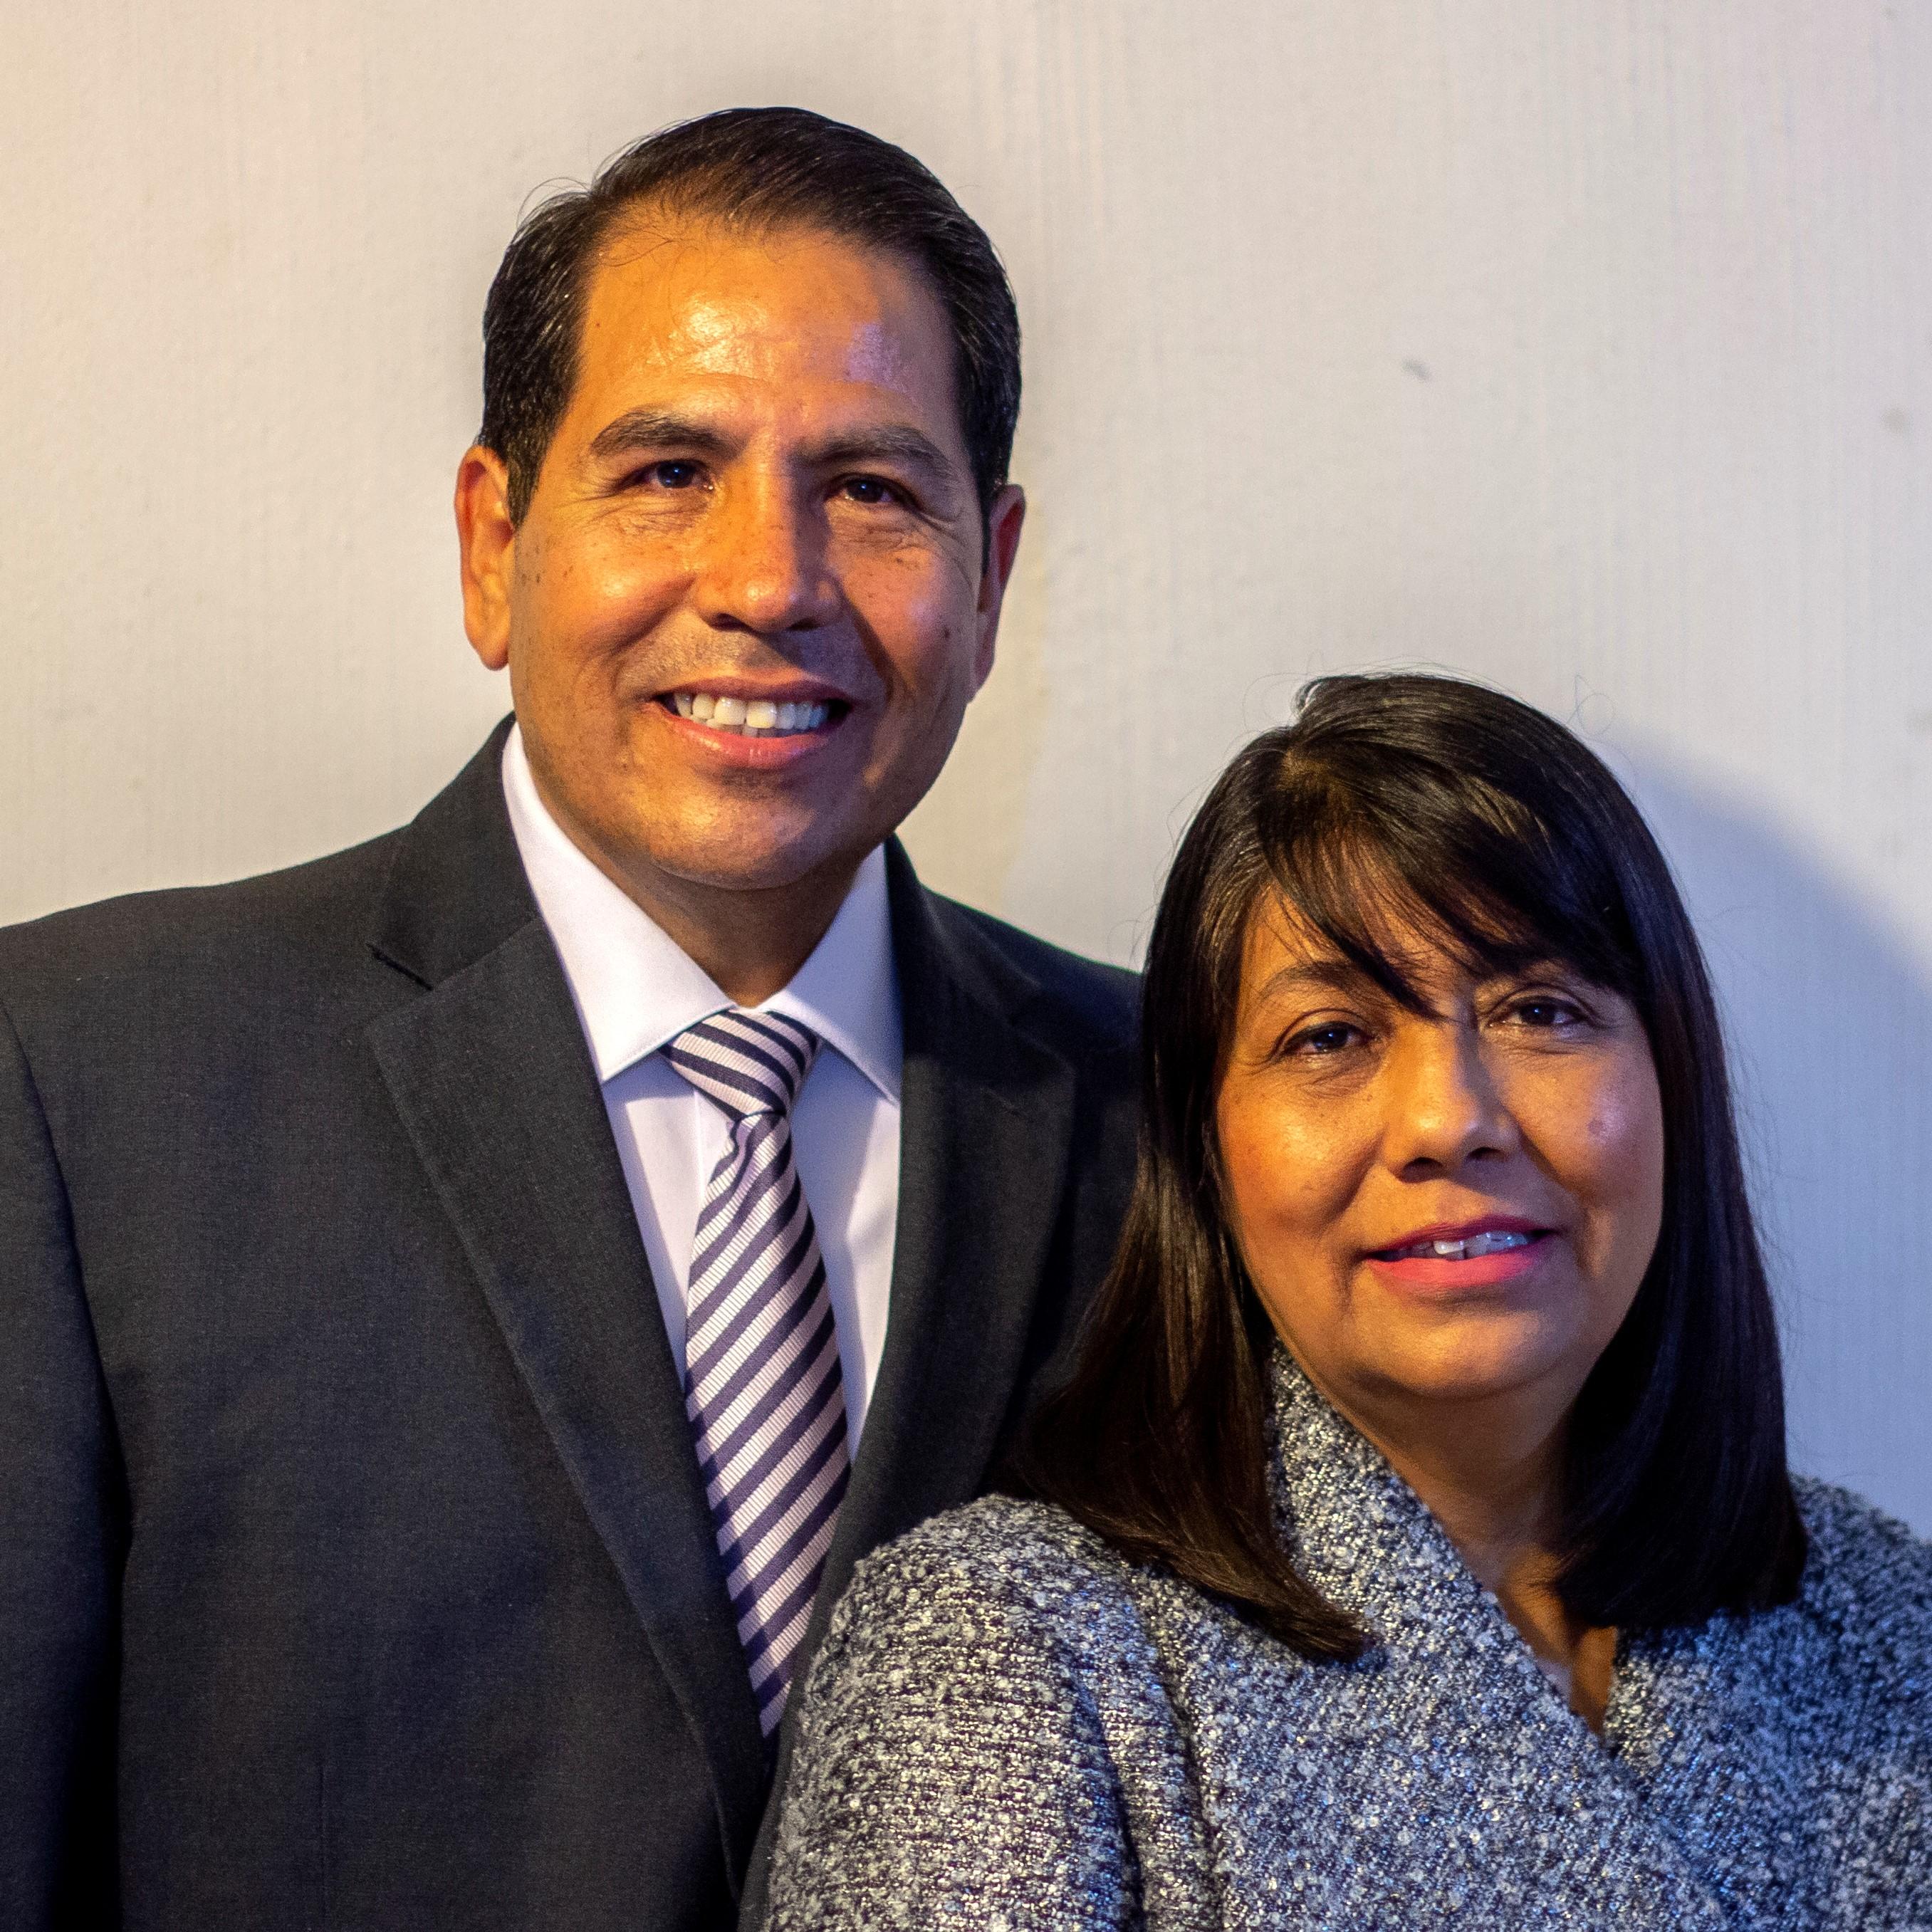 Javier and Leticia Escobarete de Romero